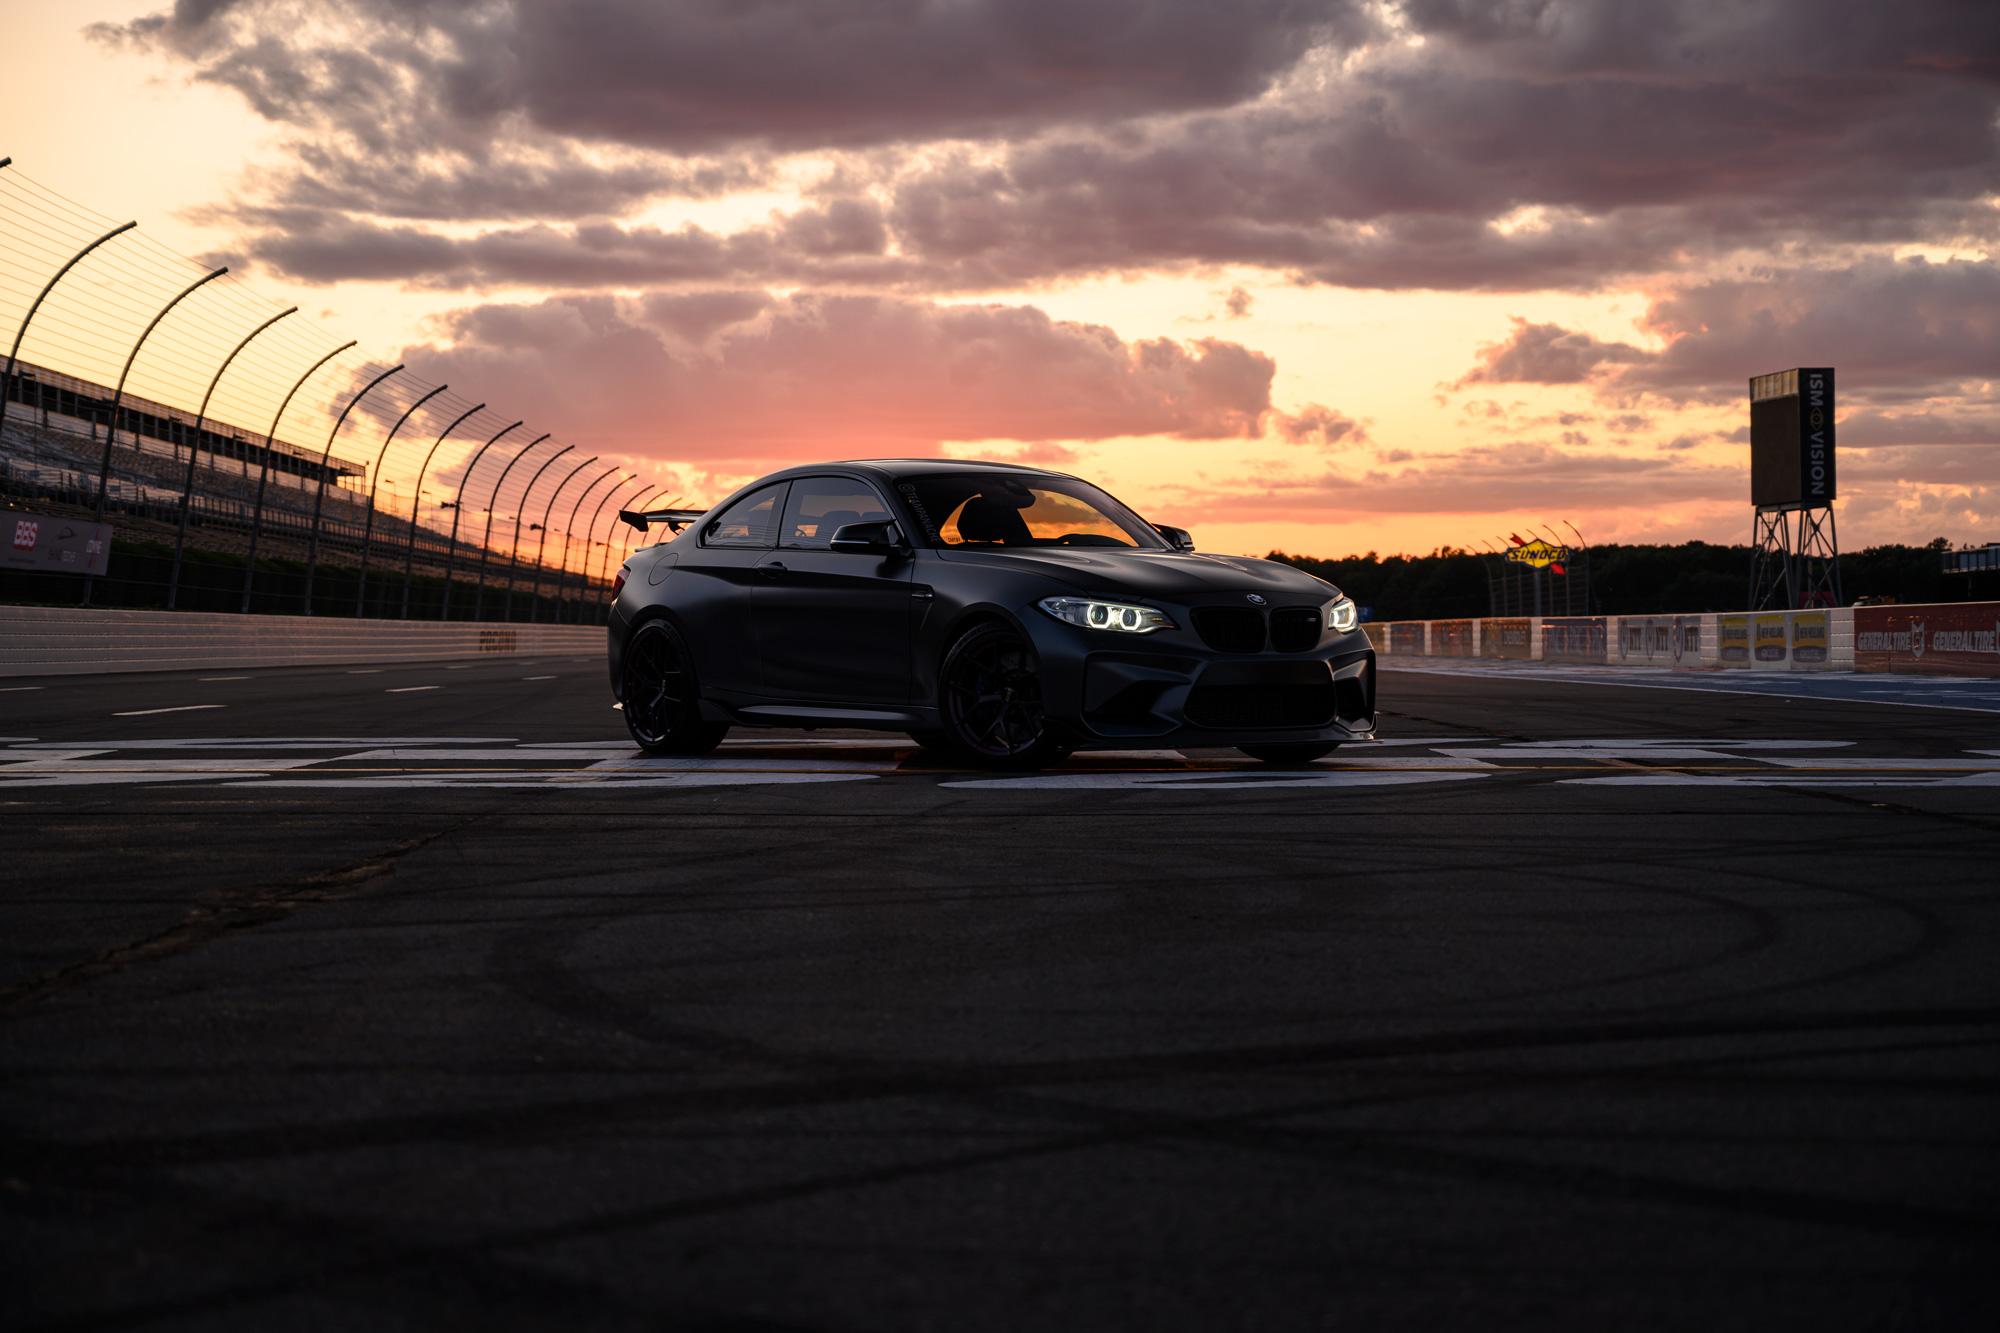 M2 sunset